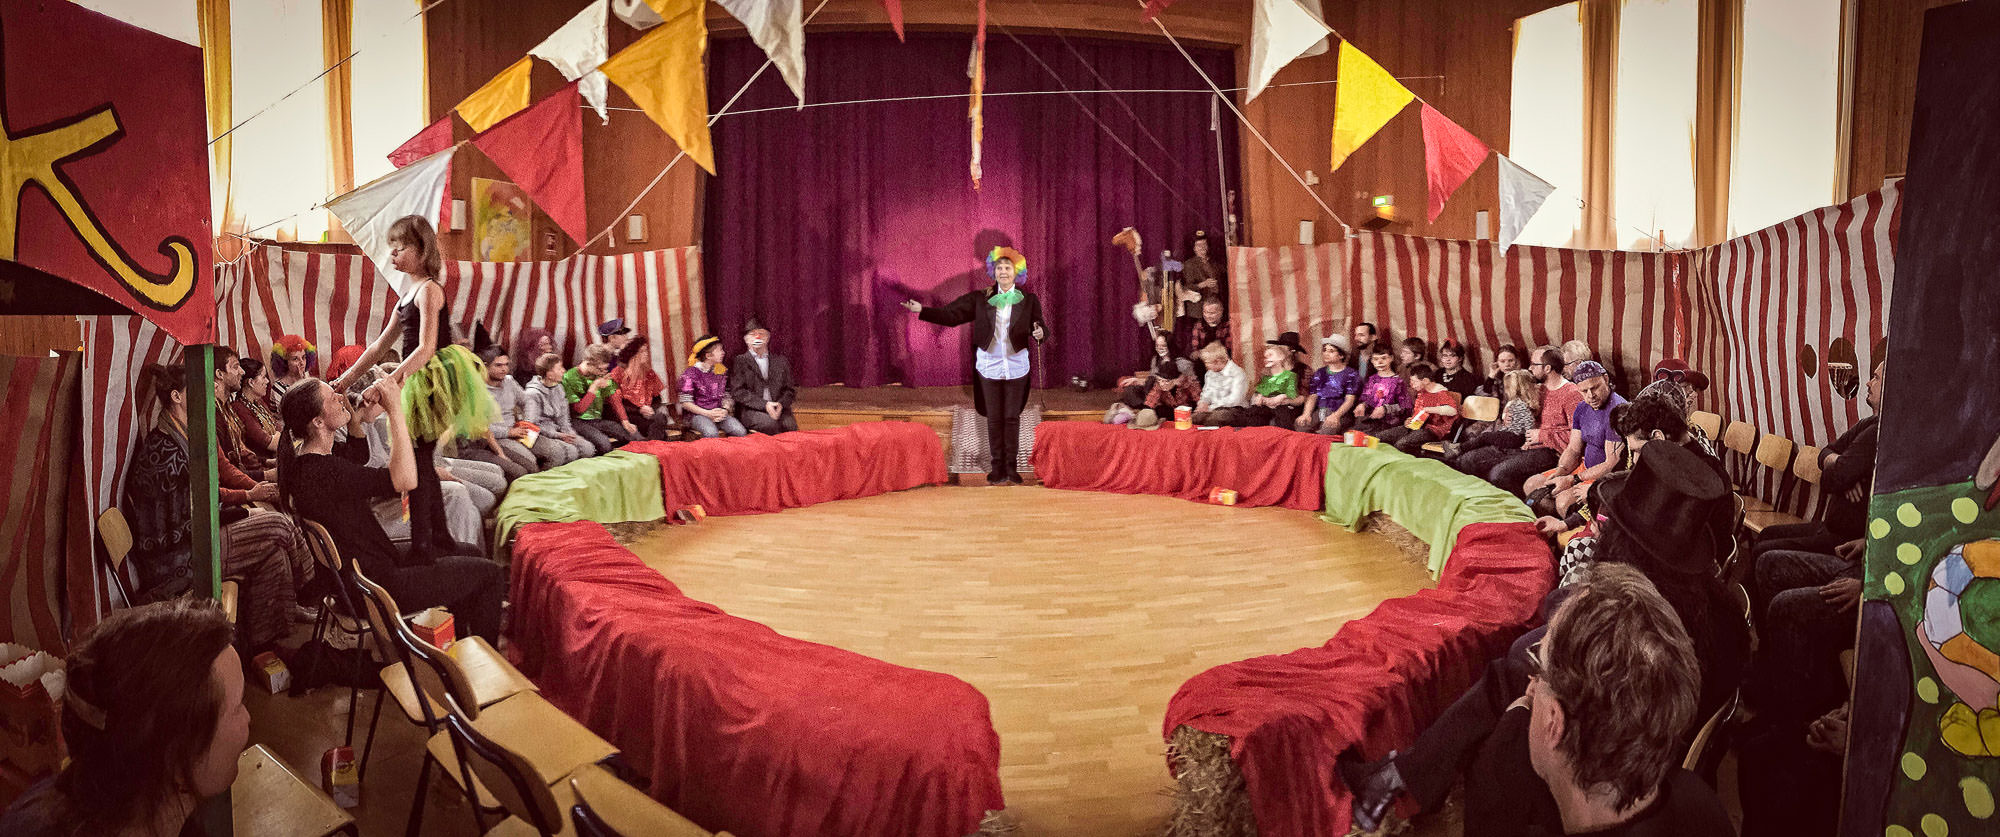 Cirkus_01_final.jpg